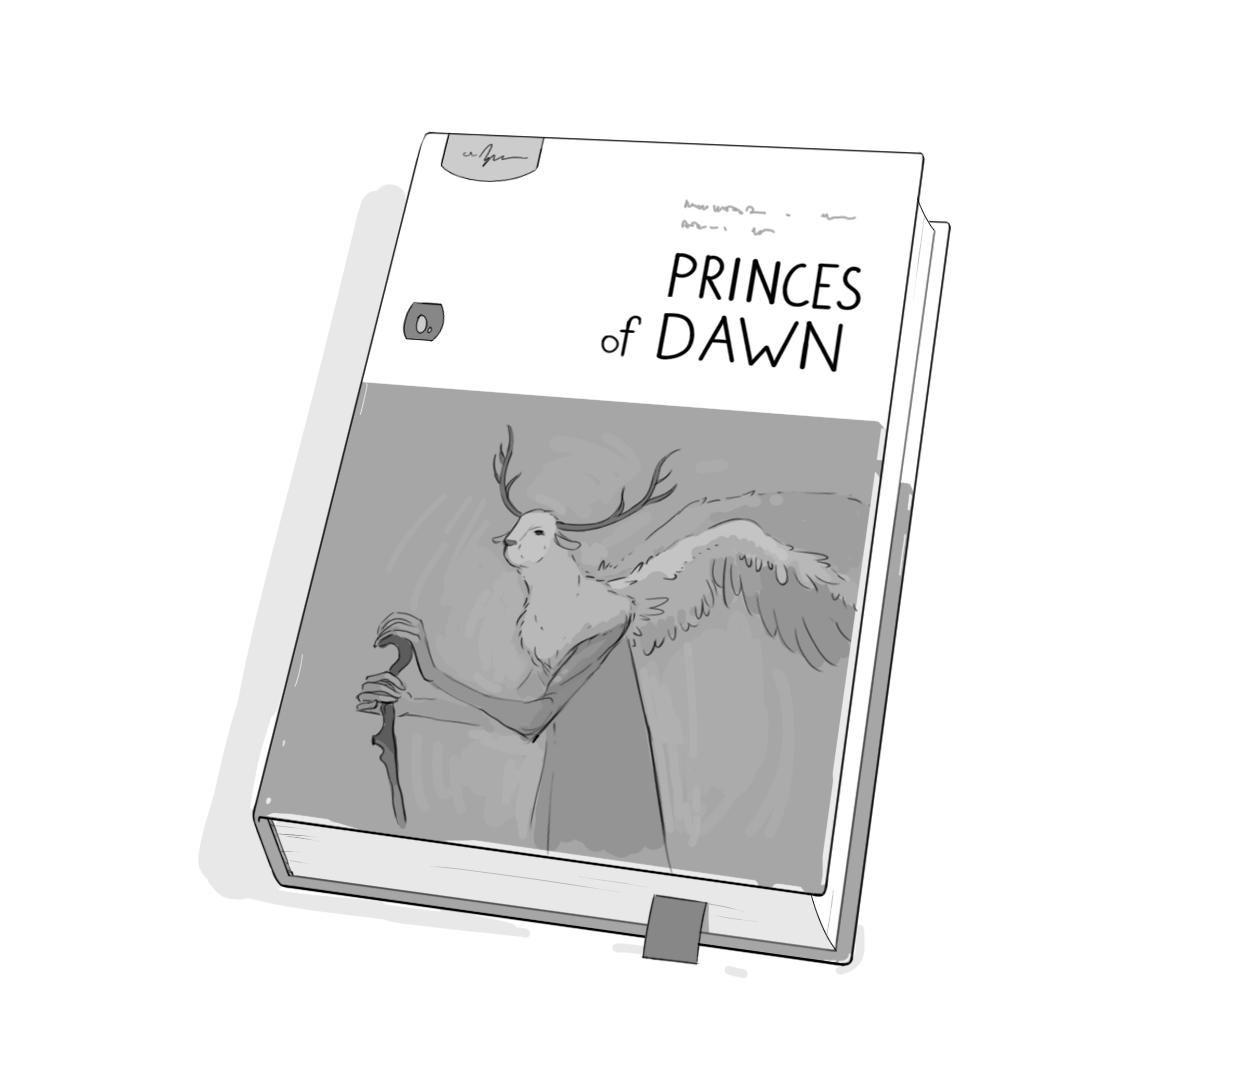 Capeworld Stories Updates--The Kamalani and Princes of Dawn